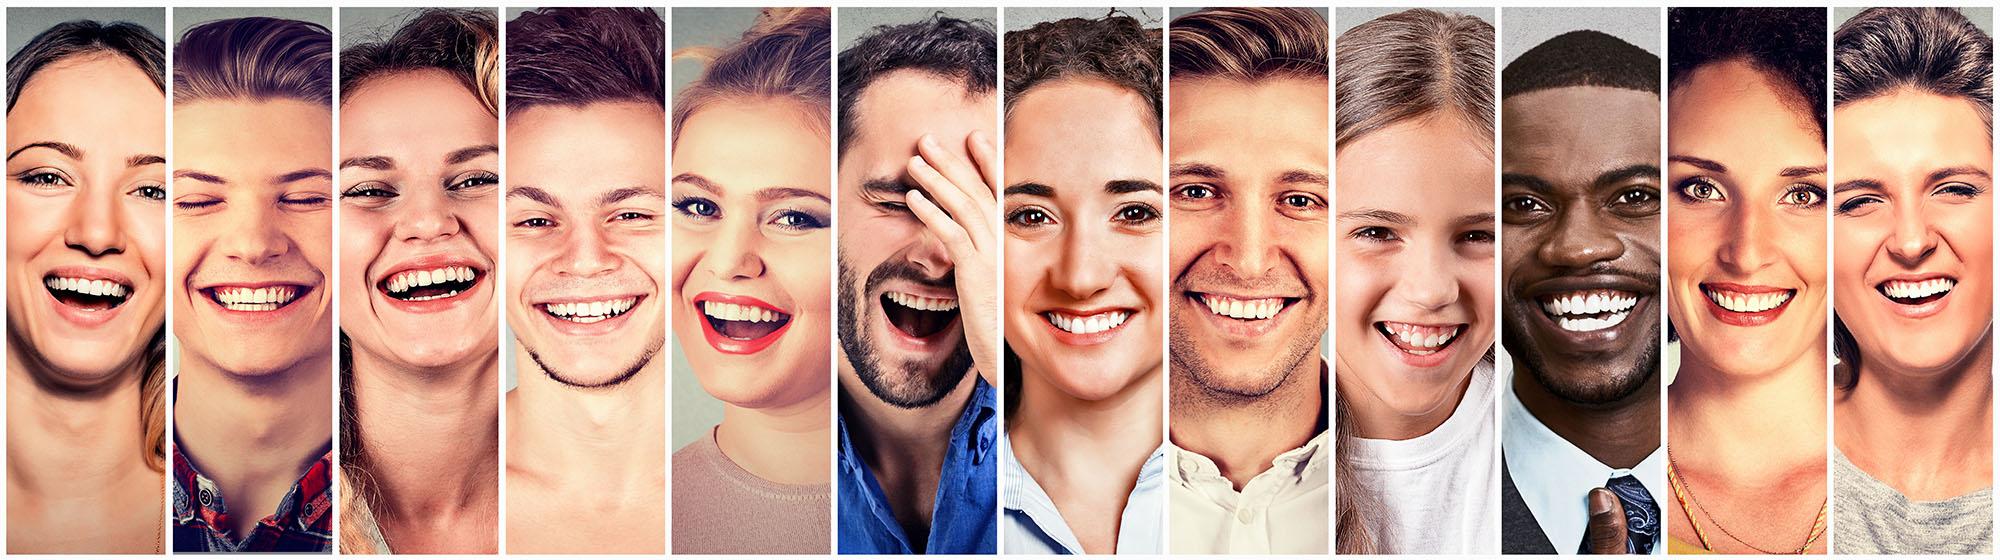 braces alternative. Laughing people. Group happy men, women, children